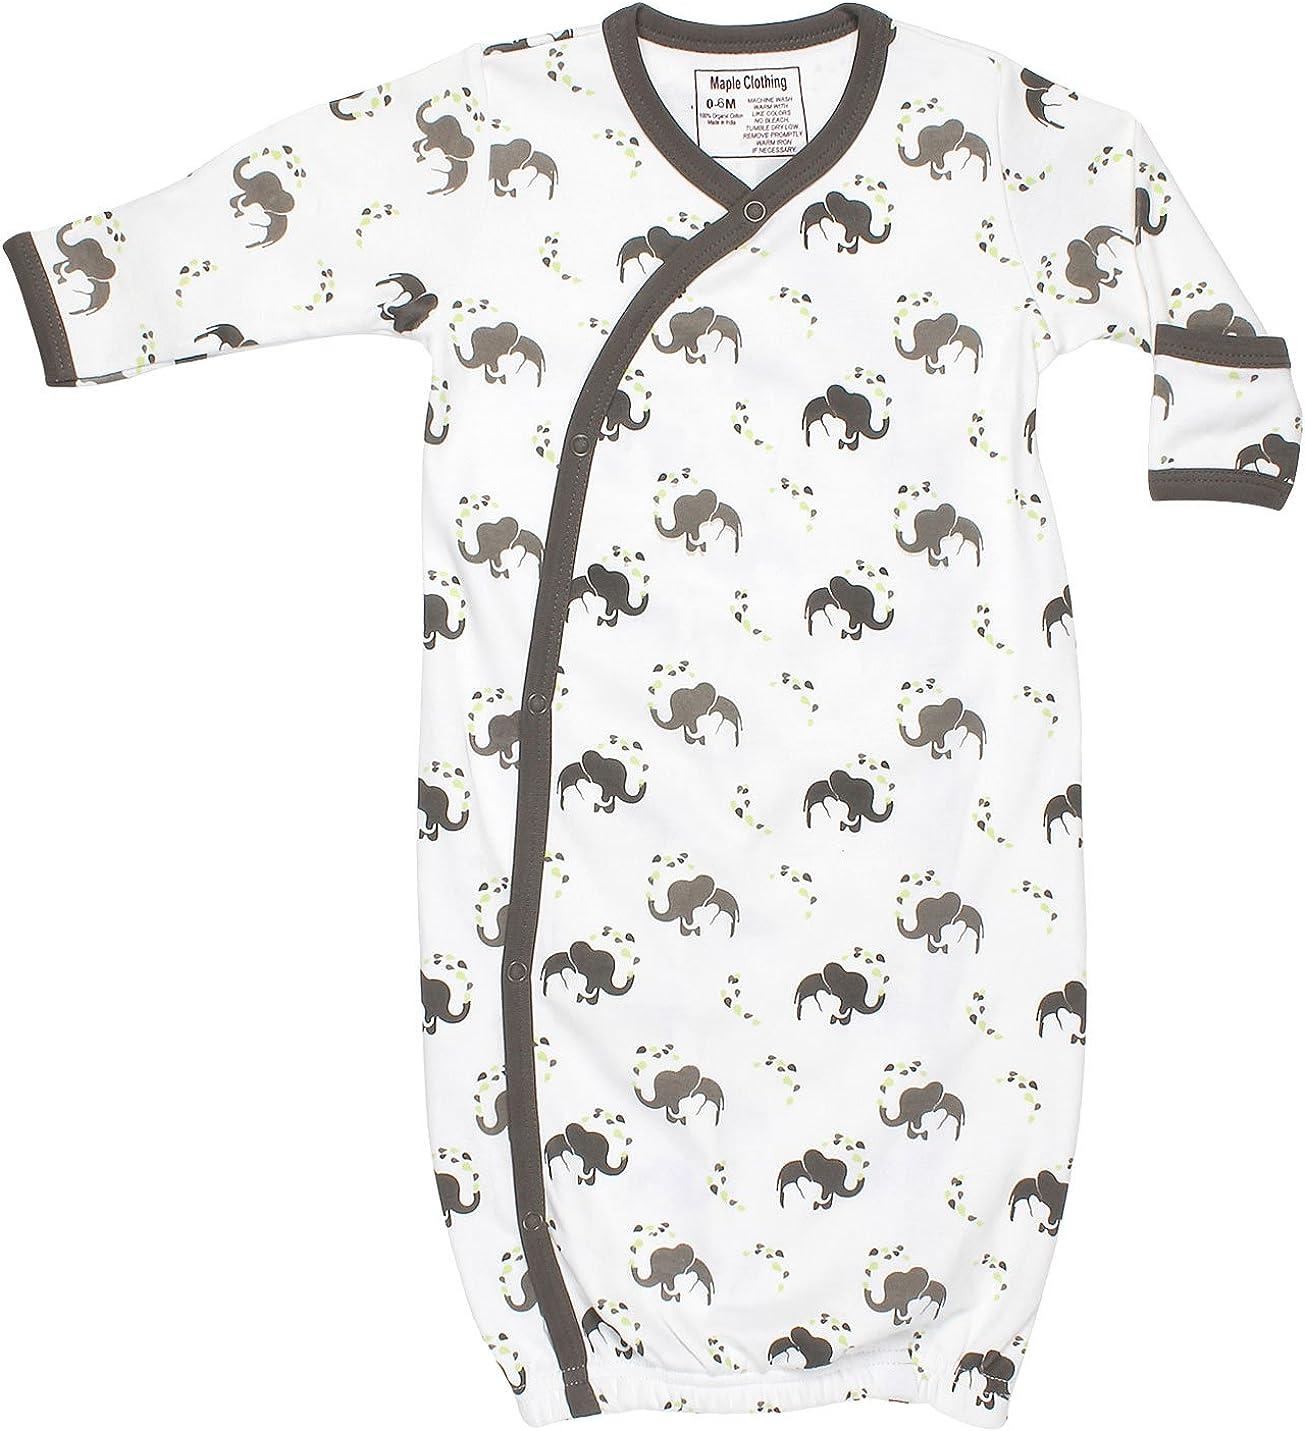 Organic Cotton Baby Bundler Sleepwear Kimono Gown GOTS Certified Clothing